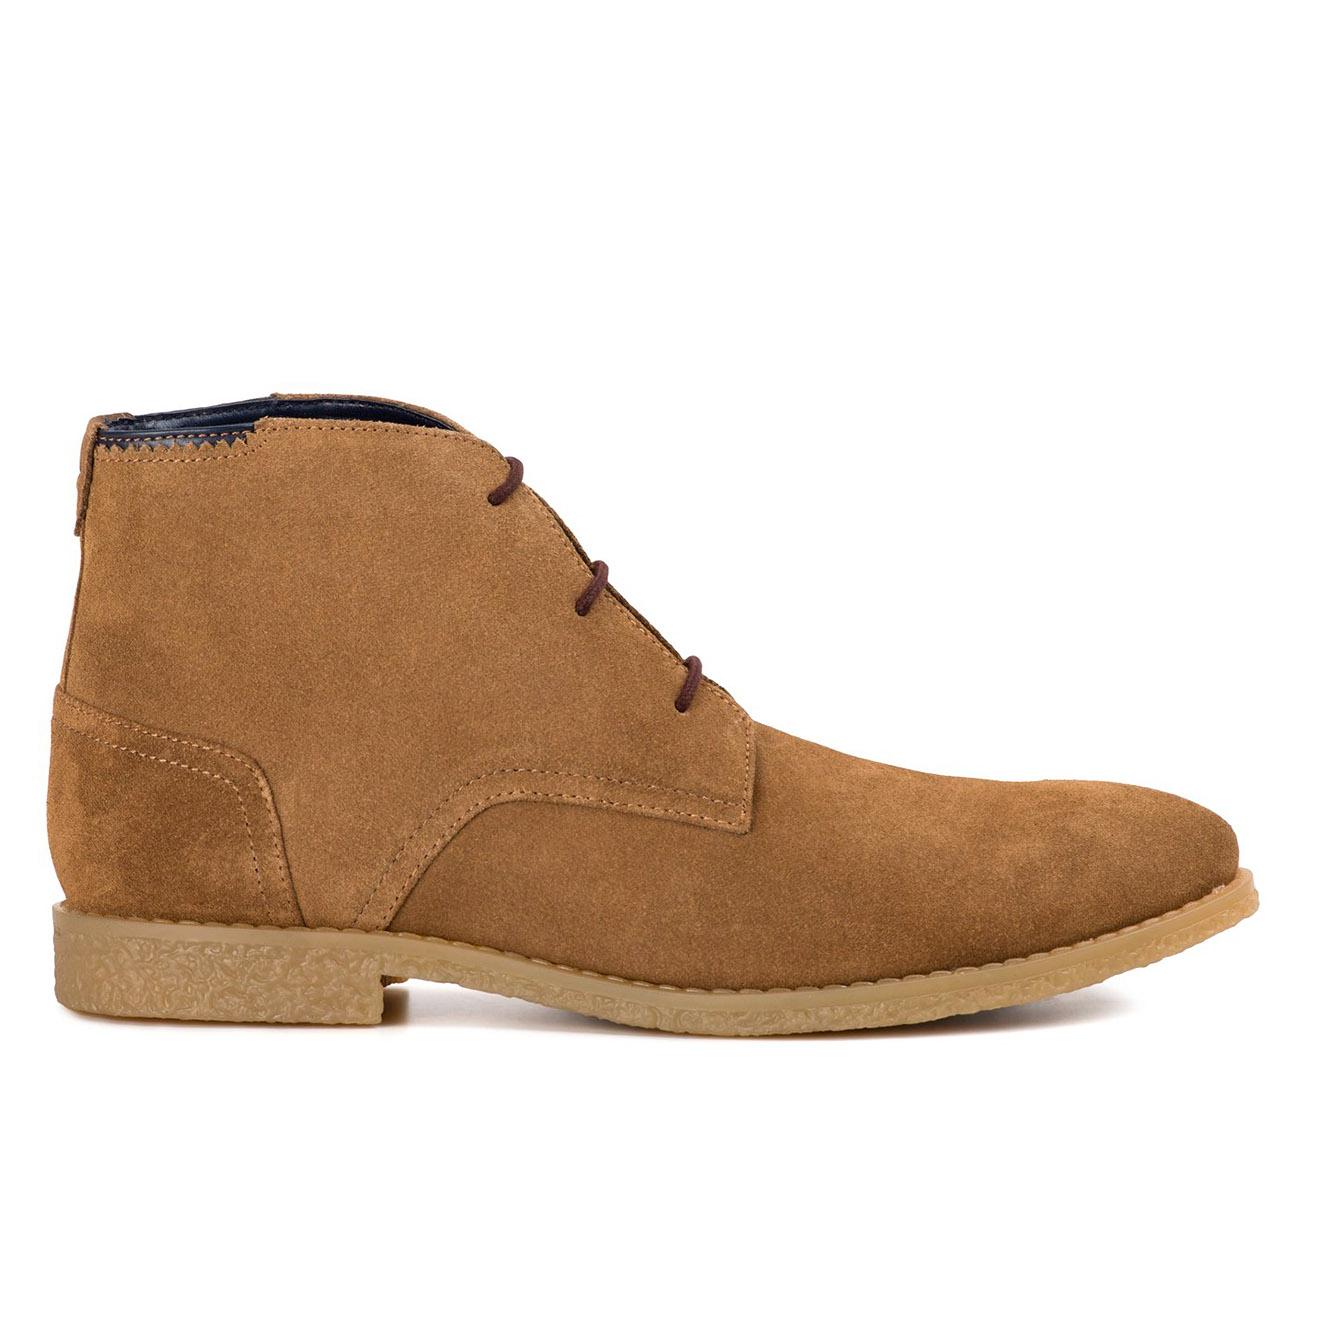 Boots en Velours de Cuir Mojave camel